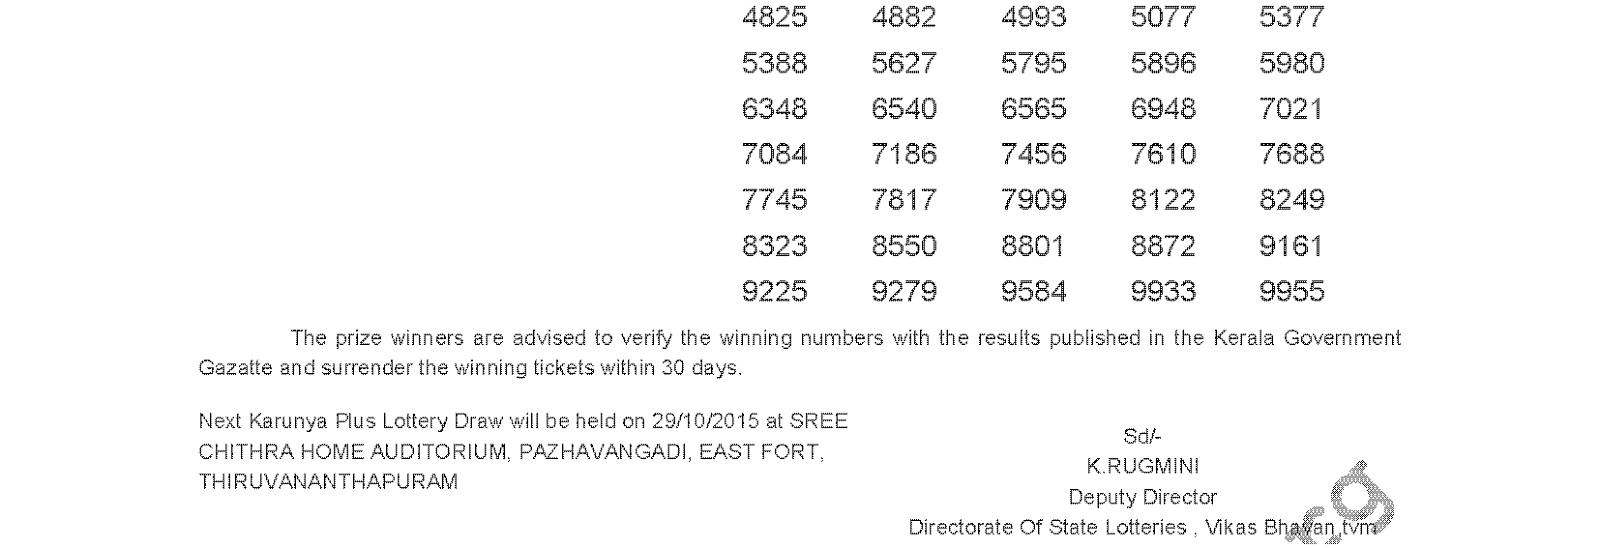 Karunya Plus Lottery KN 80 Result 22-10-2015